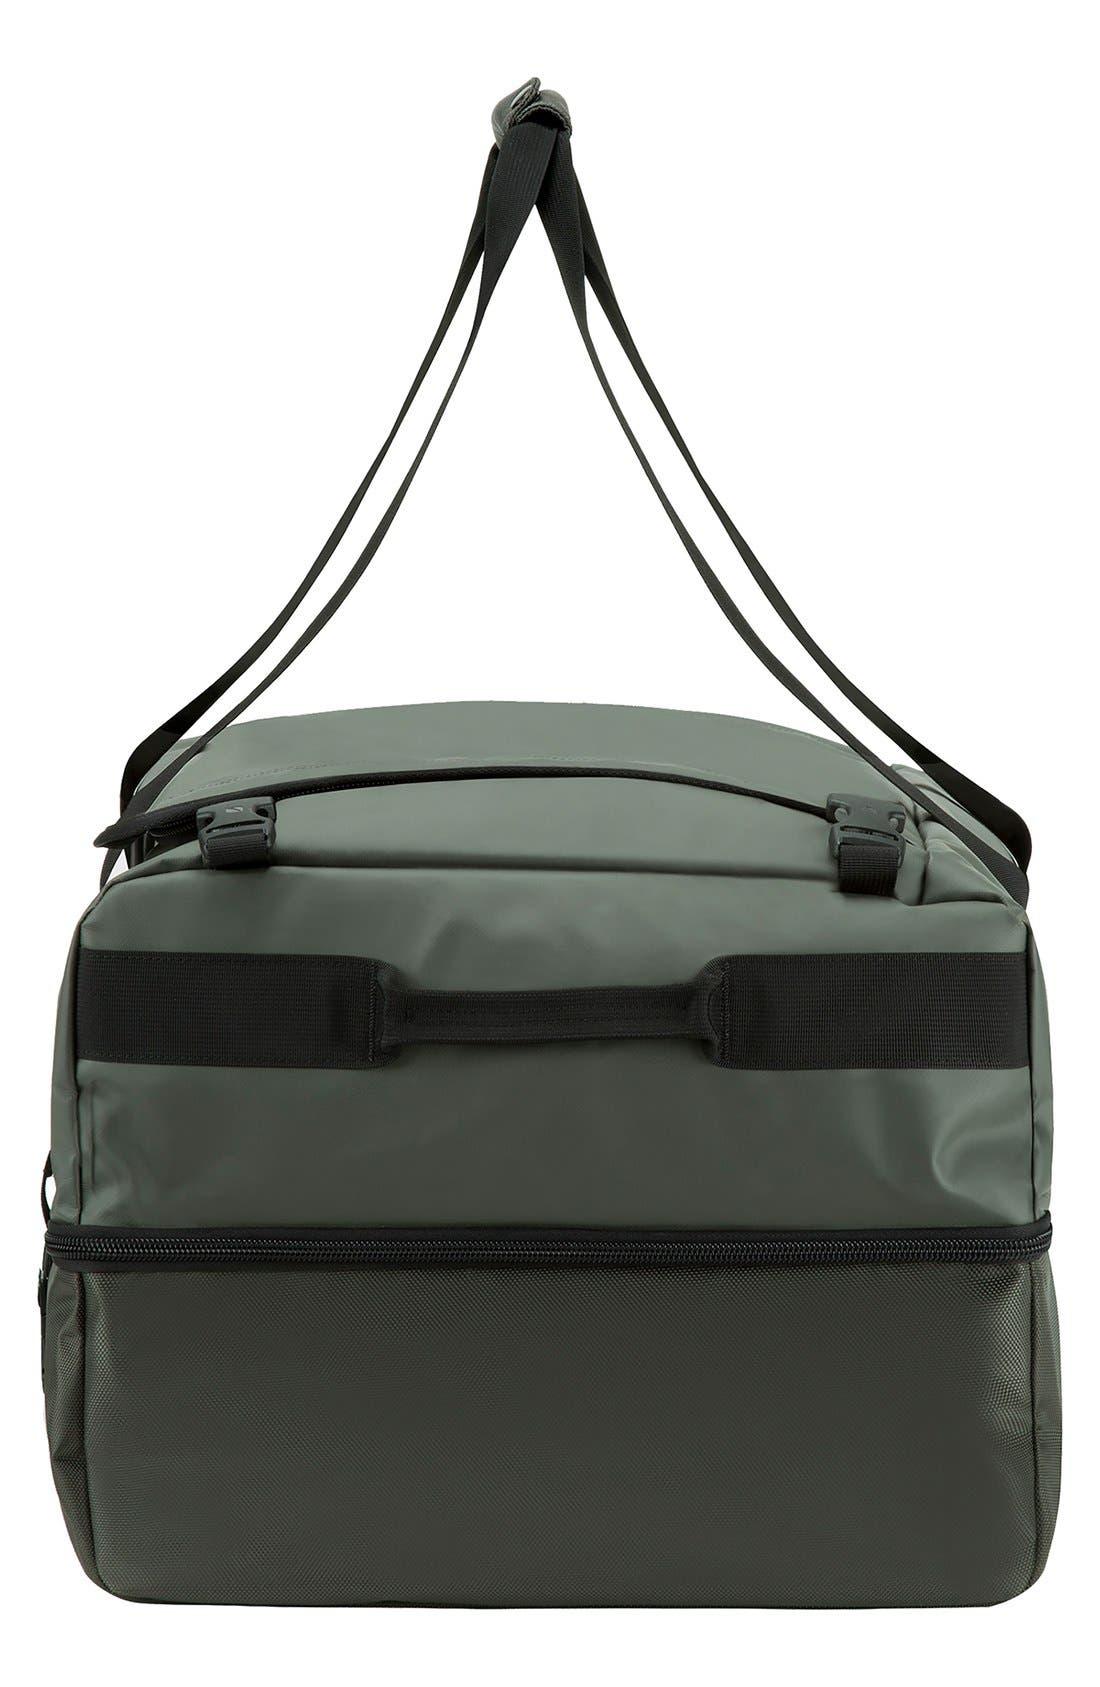 TRACTO Large Split Convertible Duffel Bag,                             Alternate thumbnail 3, color,                             Anthracite